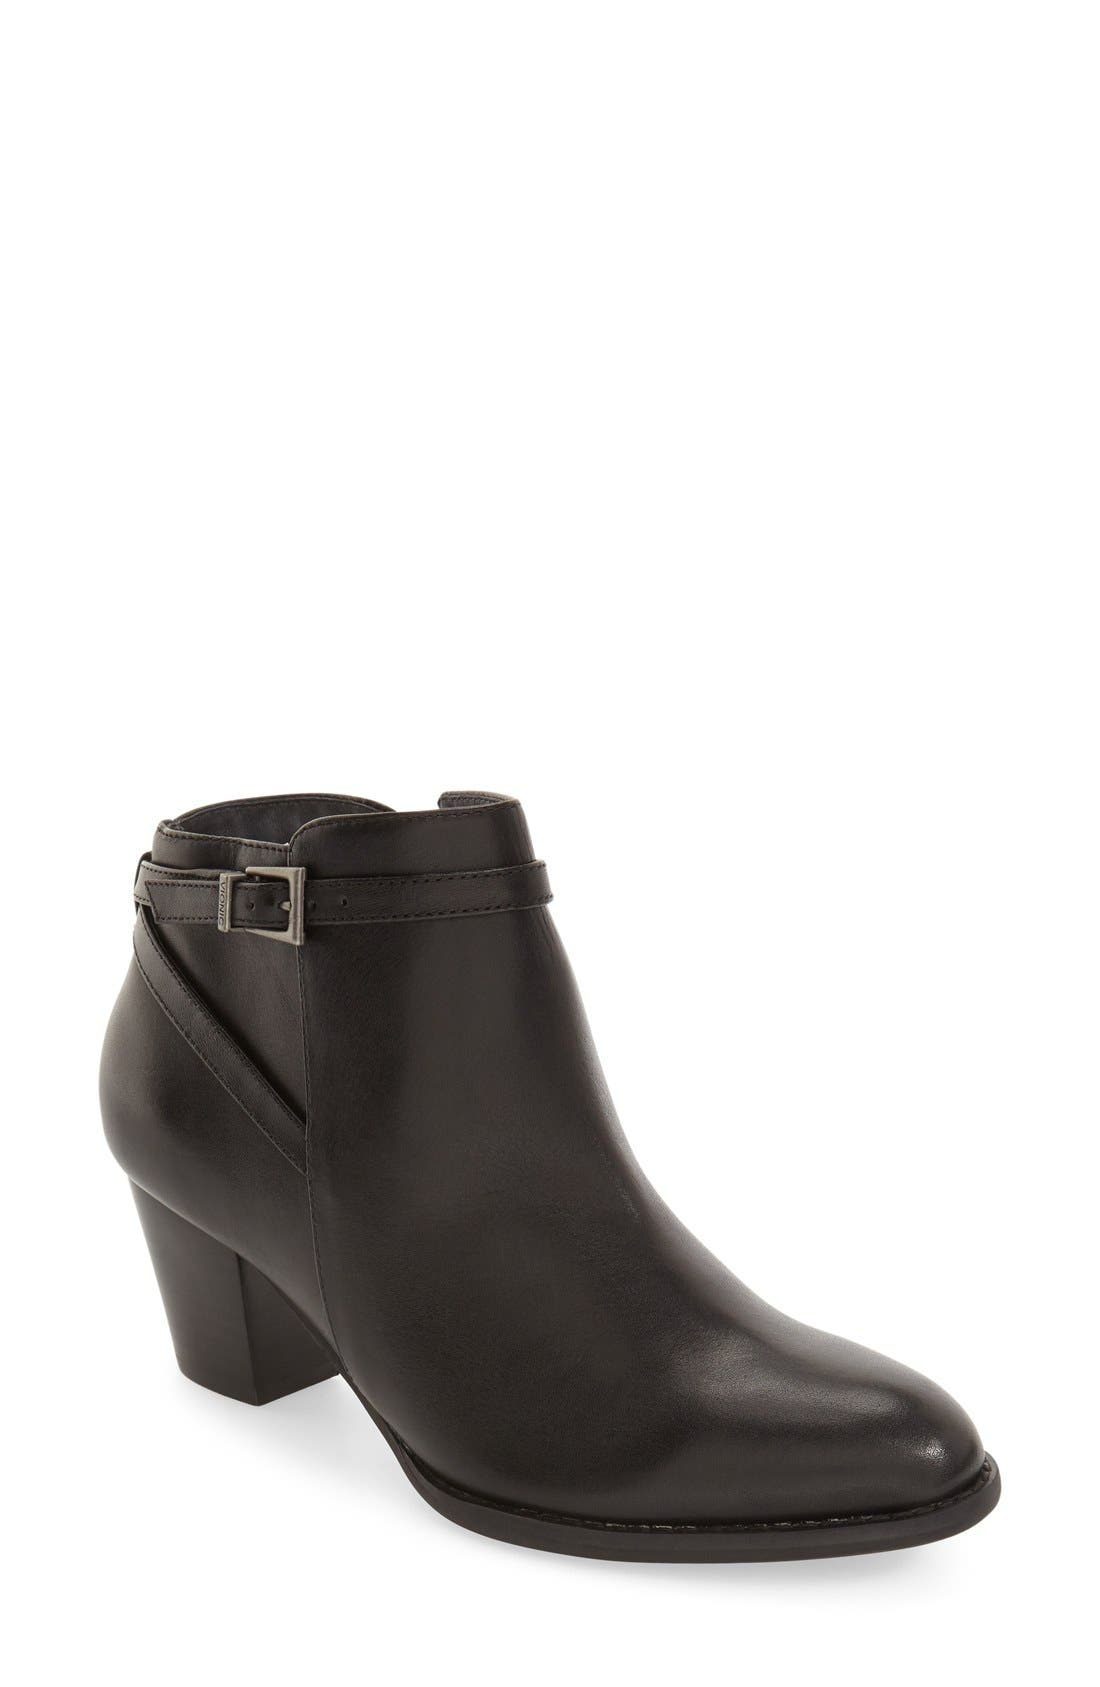 Main Image - Vionic 'Upton' Block Heel Boot (Women)